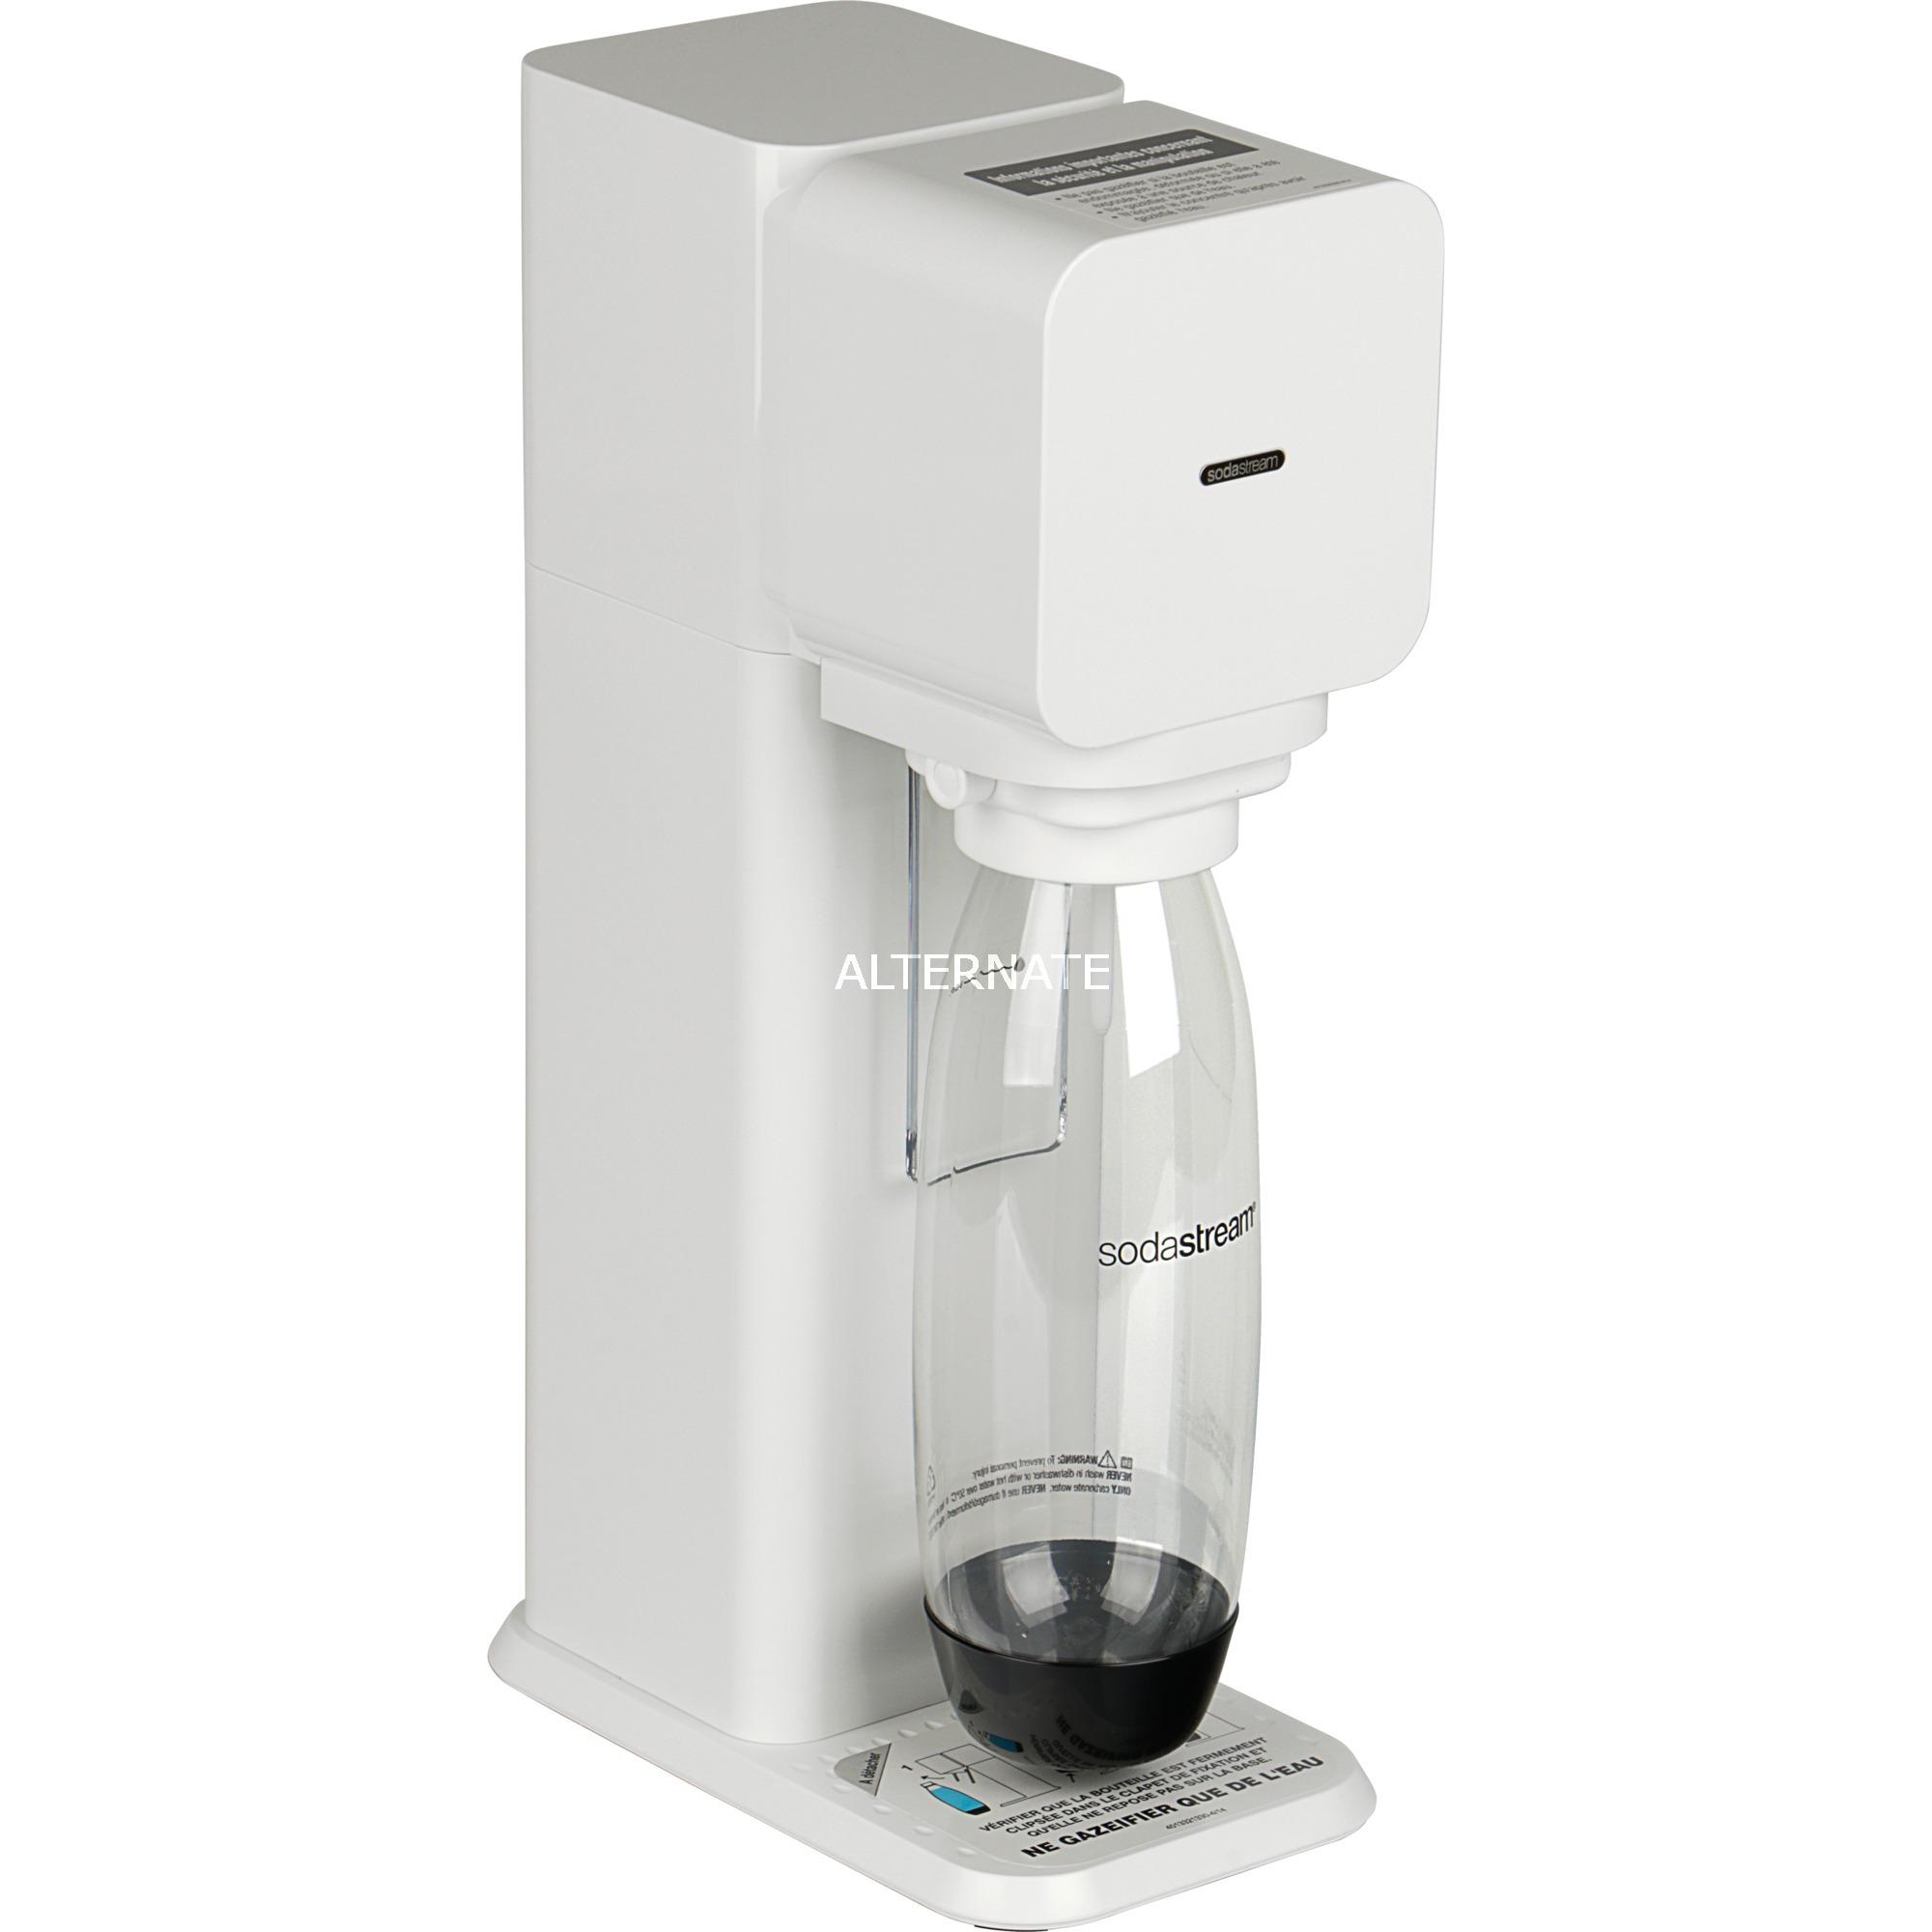 Play Tereftalato de polietileno (PET) Blanco, Gasificador de agua